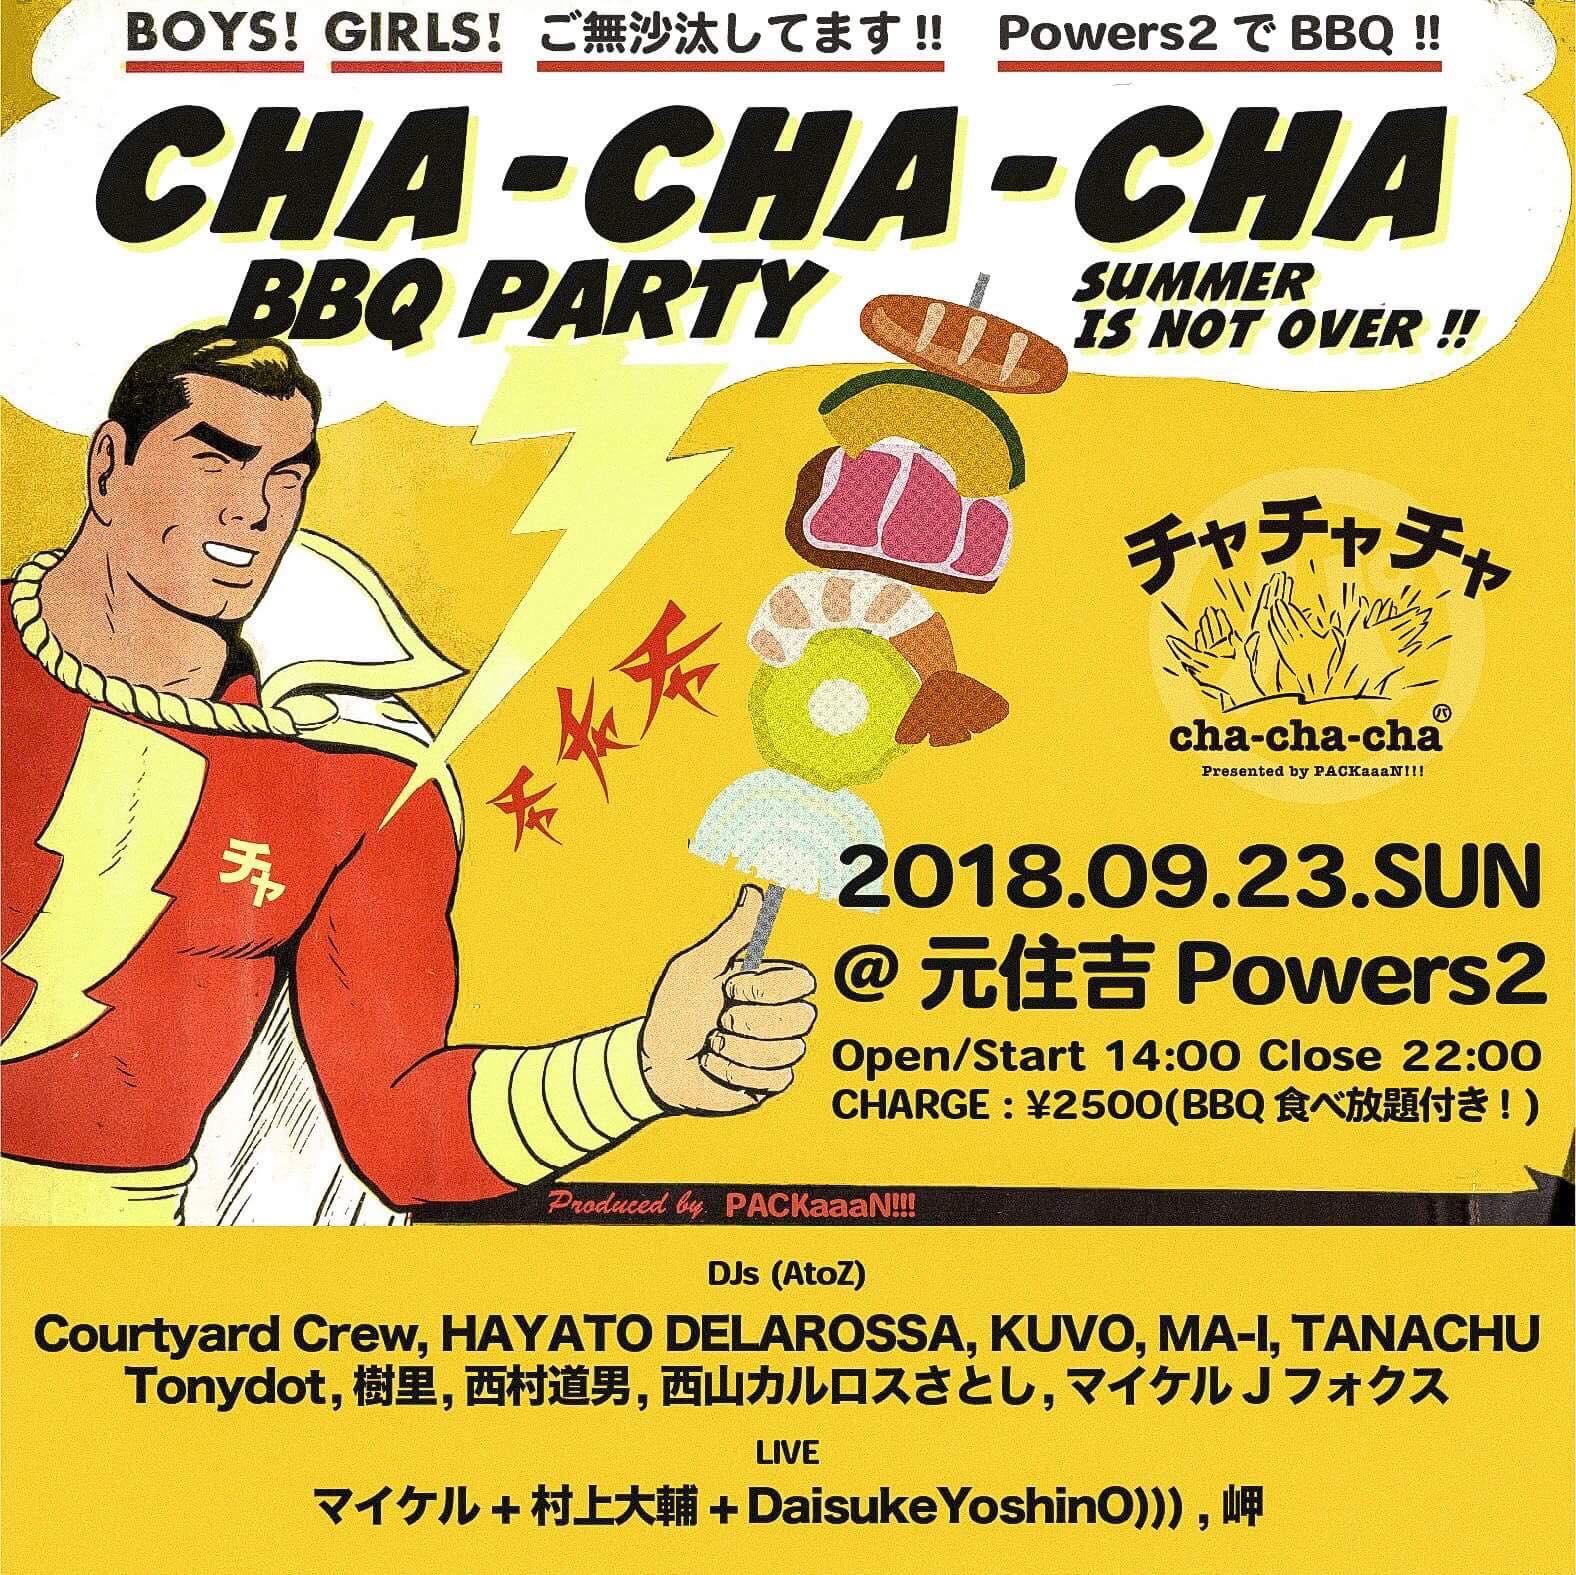 923(SUN) 元住吉POWERS2 チャチャチャ BBQ PARTY